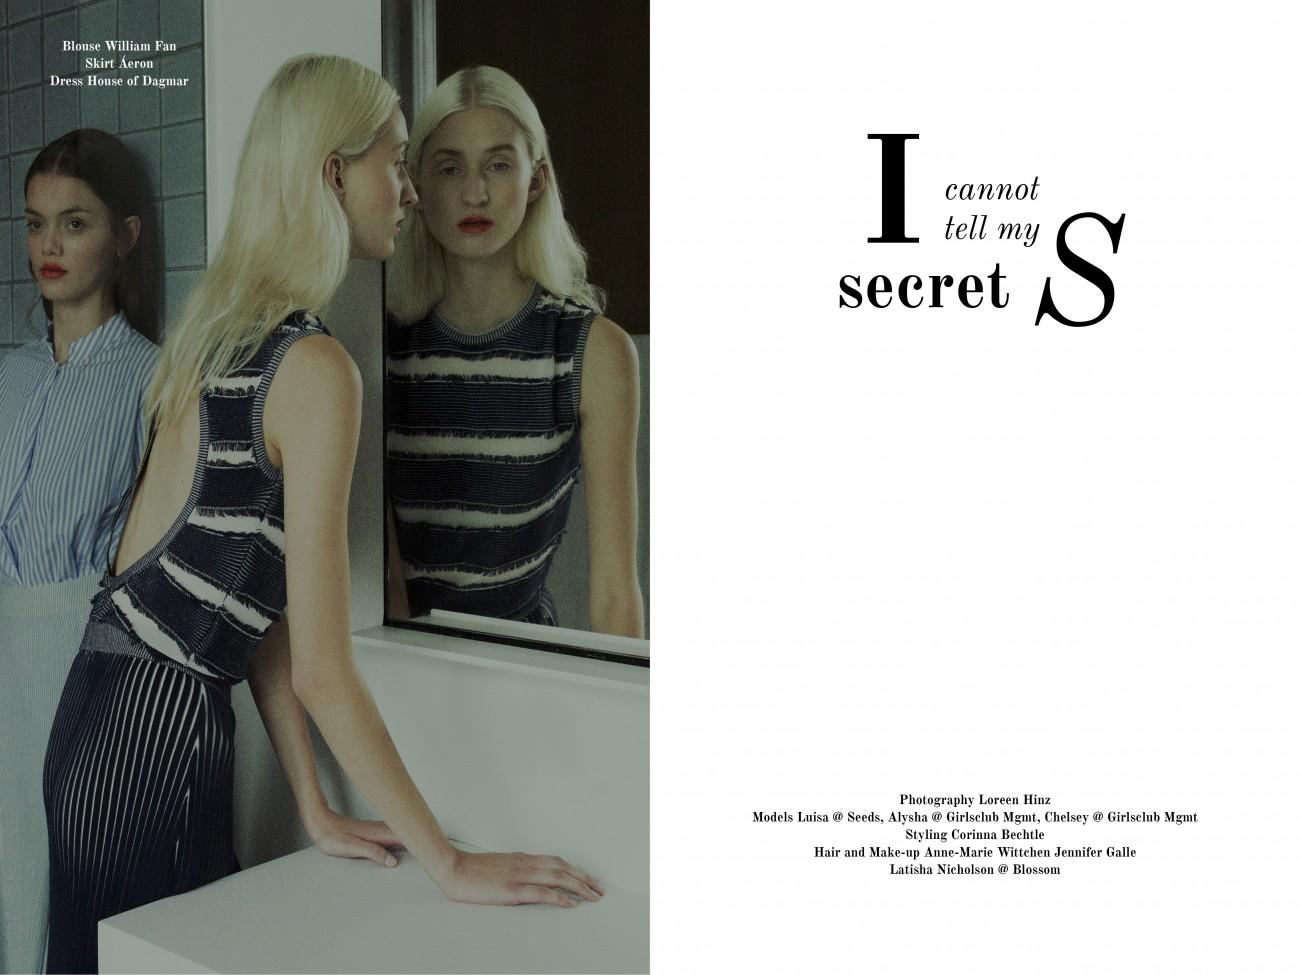 Loreen-Hinz-I-Cannot-Tell-My-Secrets-OE-Magazine-01